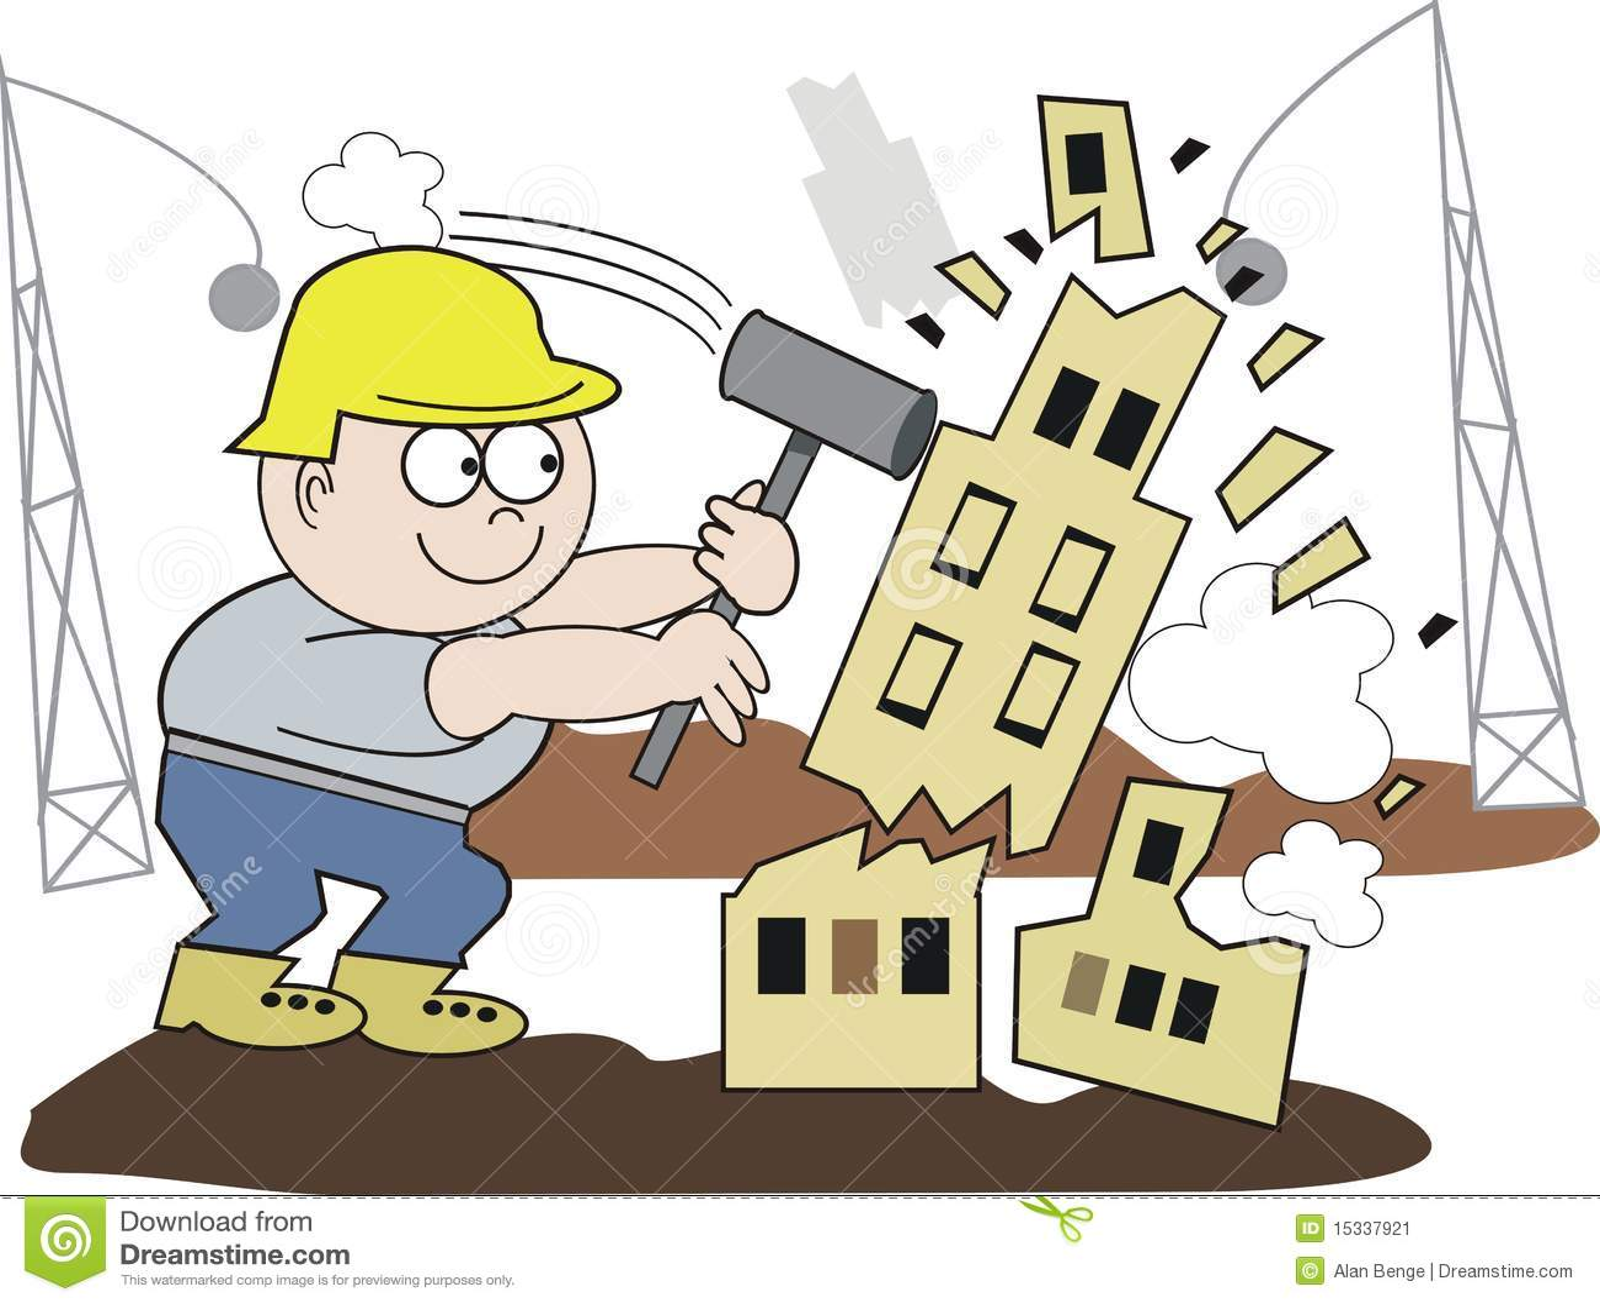 Building Demolition Cartoon : Demolition man cartoon stock vector image of worker